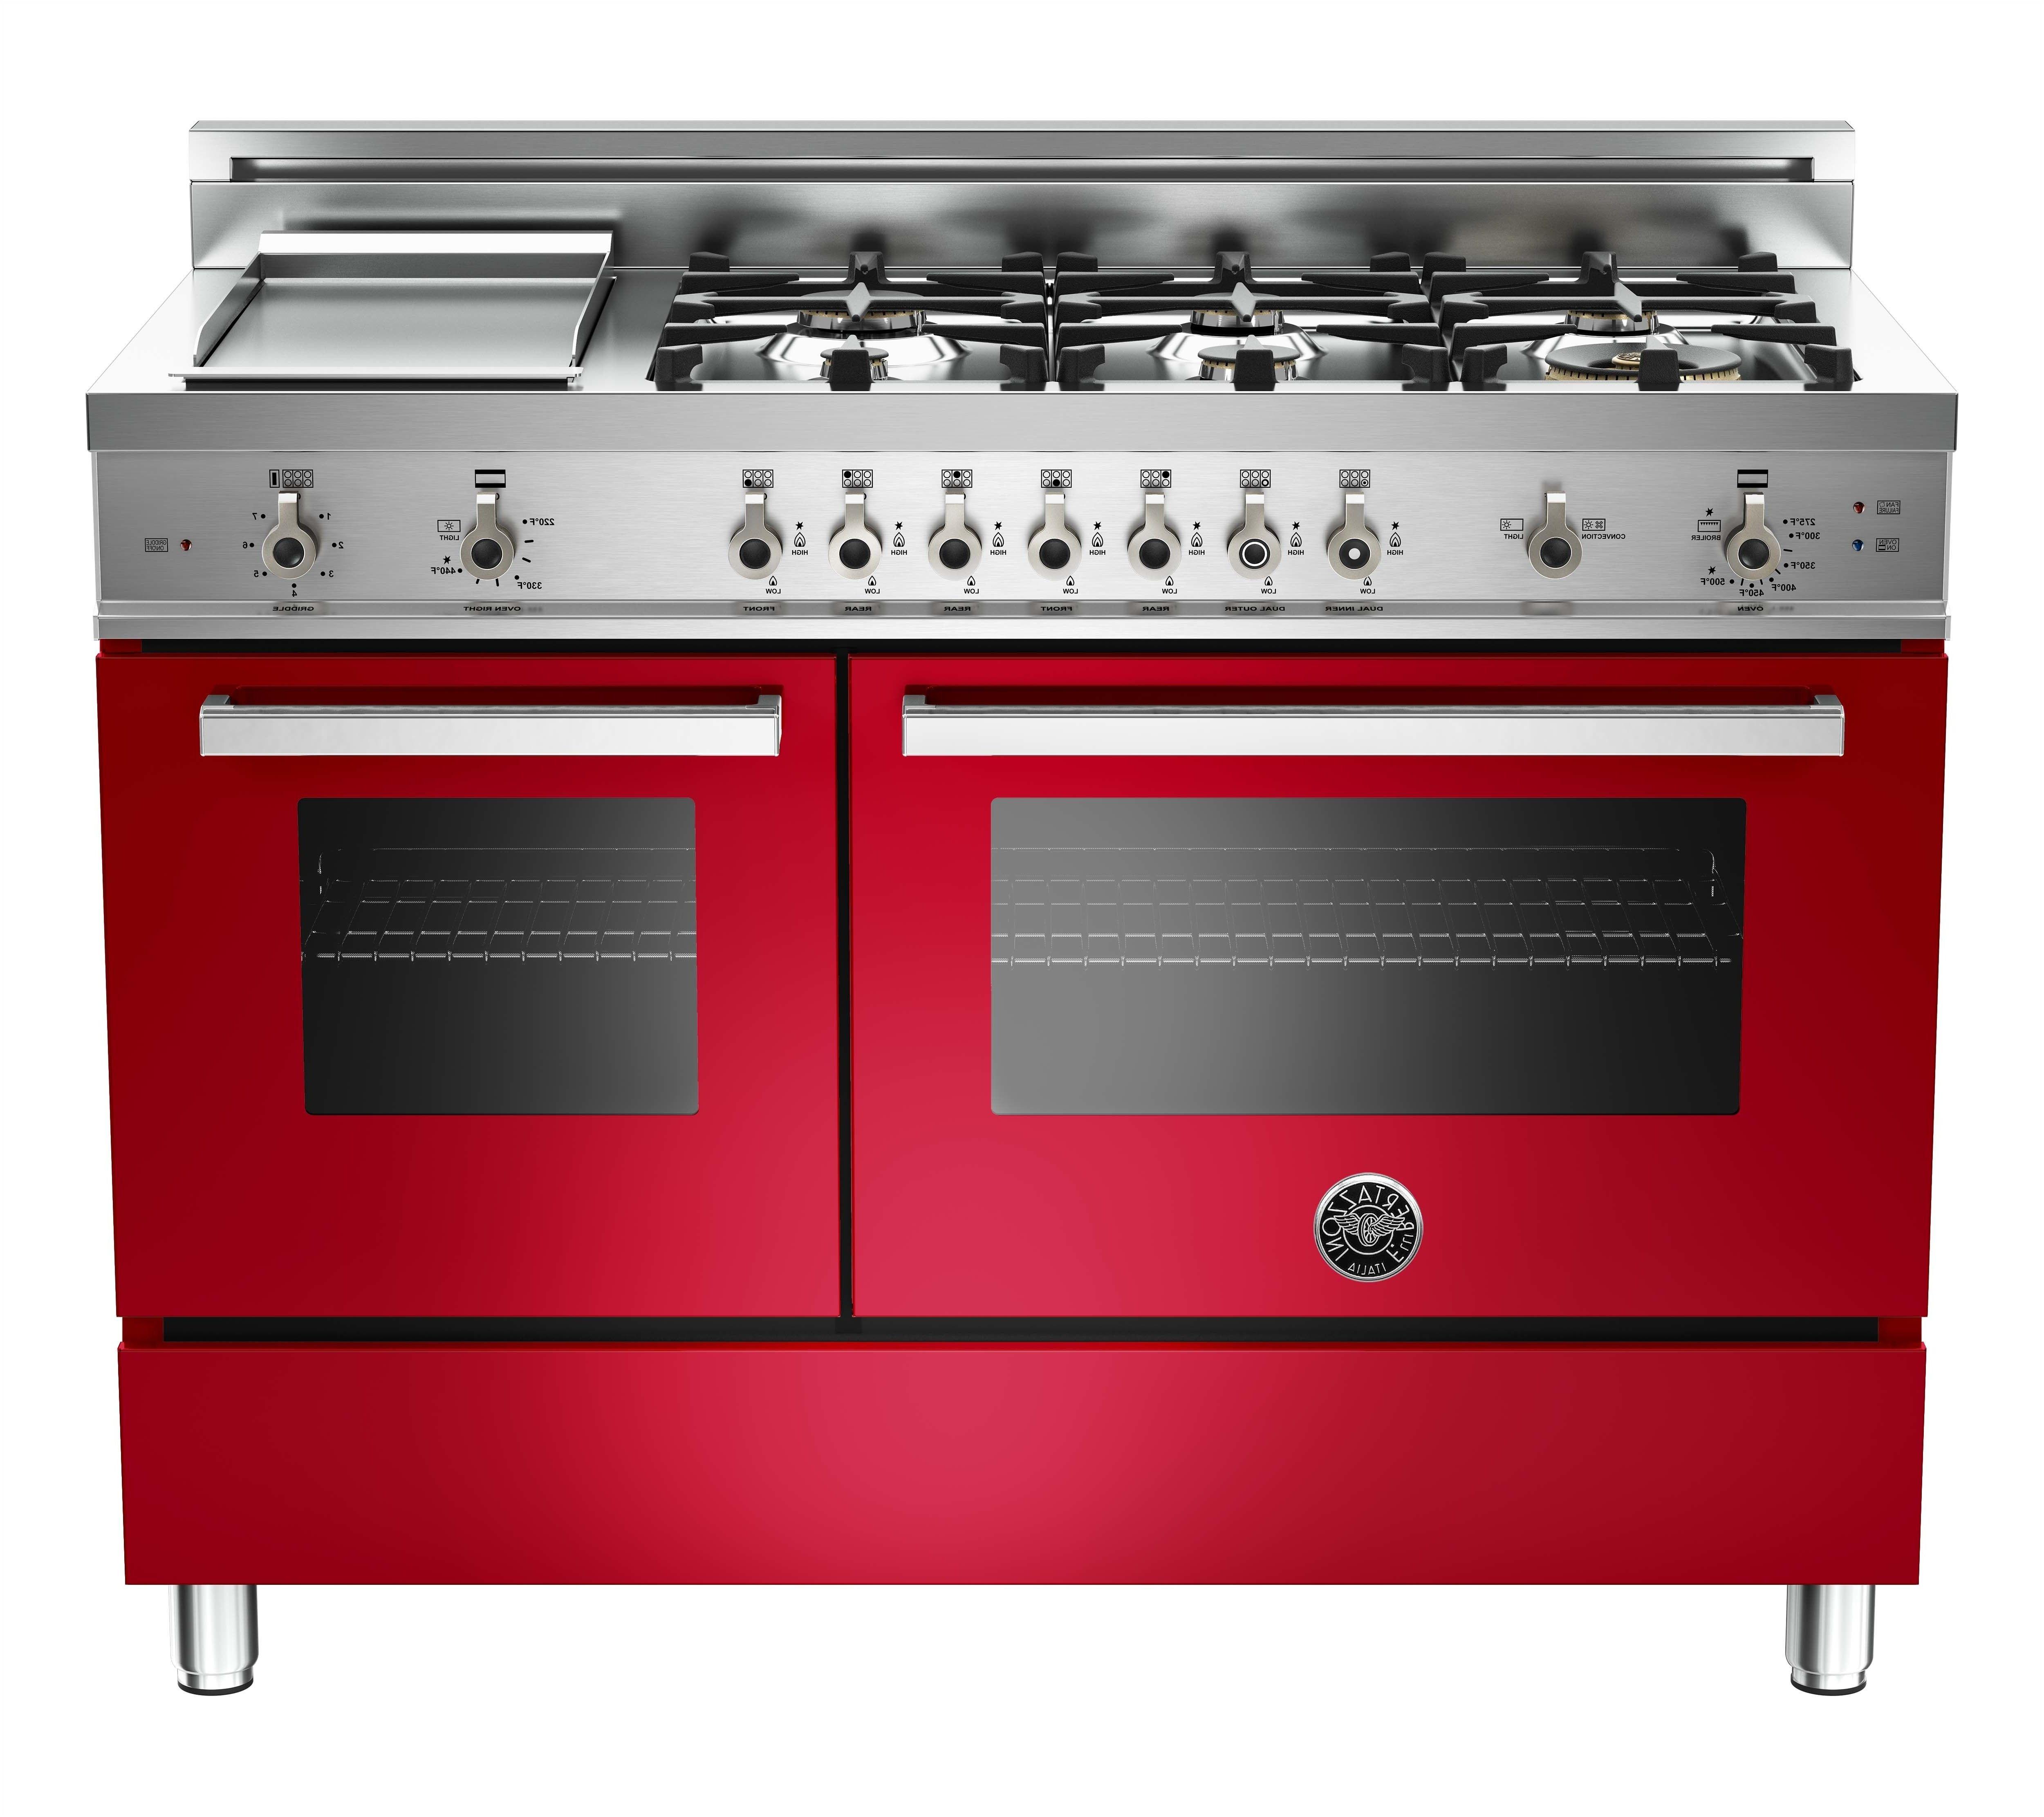 best luxury appliance brands photos architectural digest from best rh pinterest com  top name brand kitchen appliances